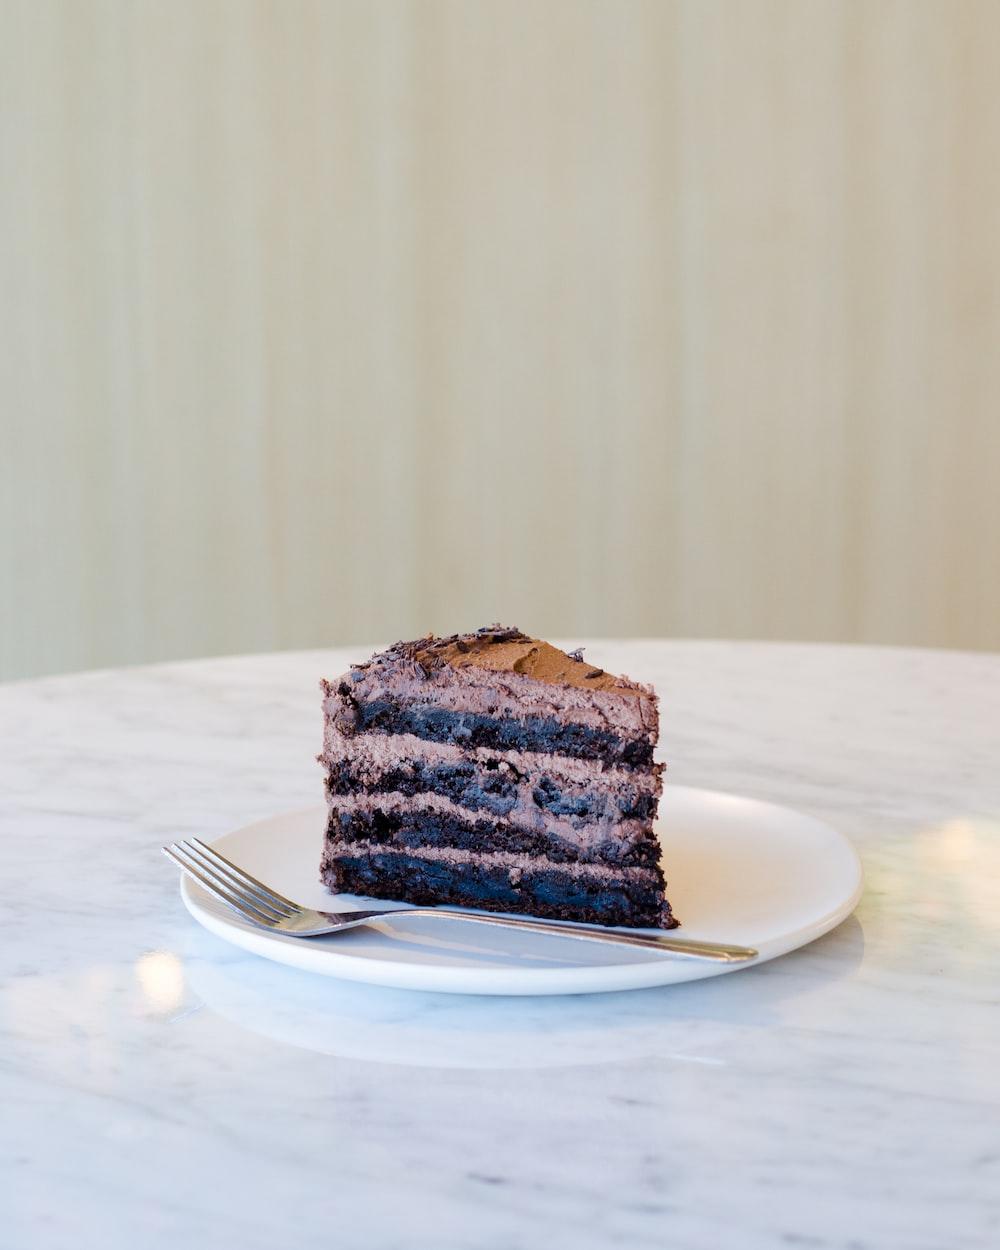 sliced chocolate cake beside fork on plate